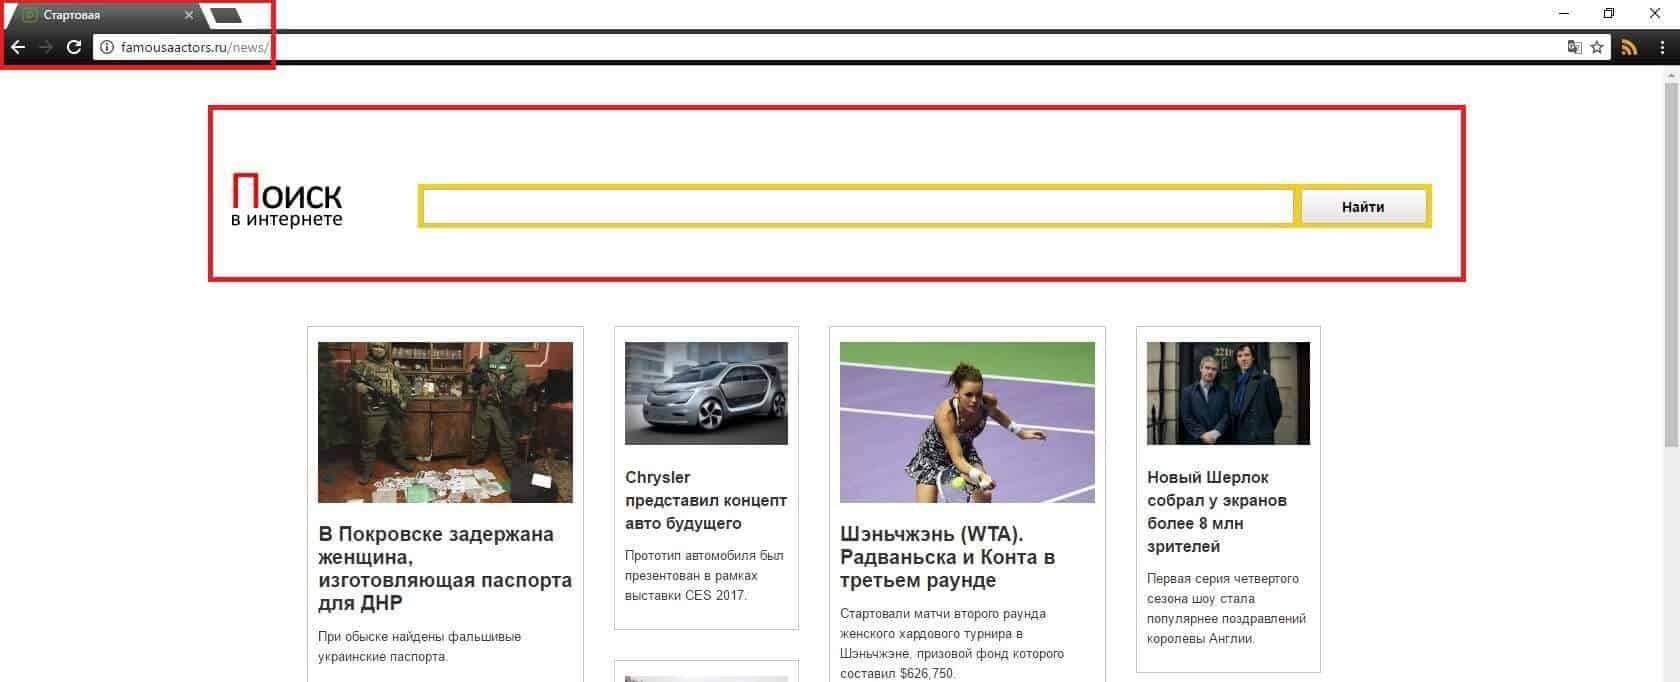 Famousaactors.ru Browser Redirect